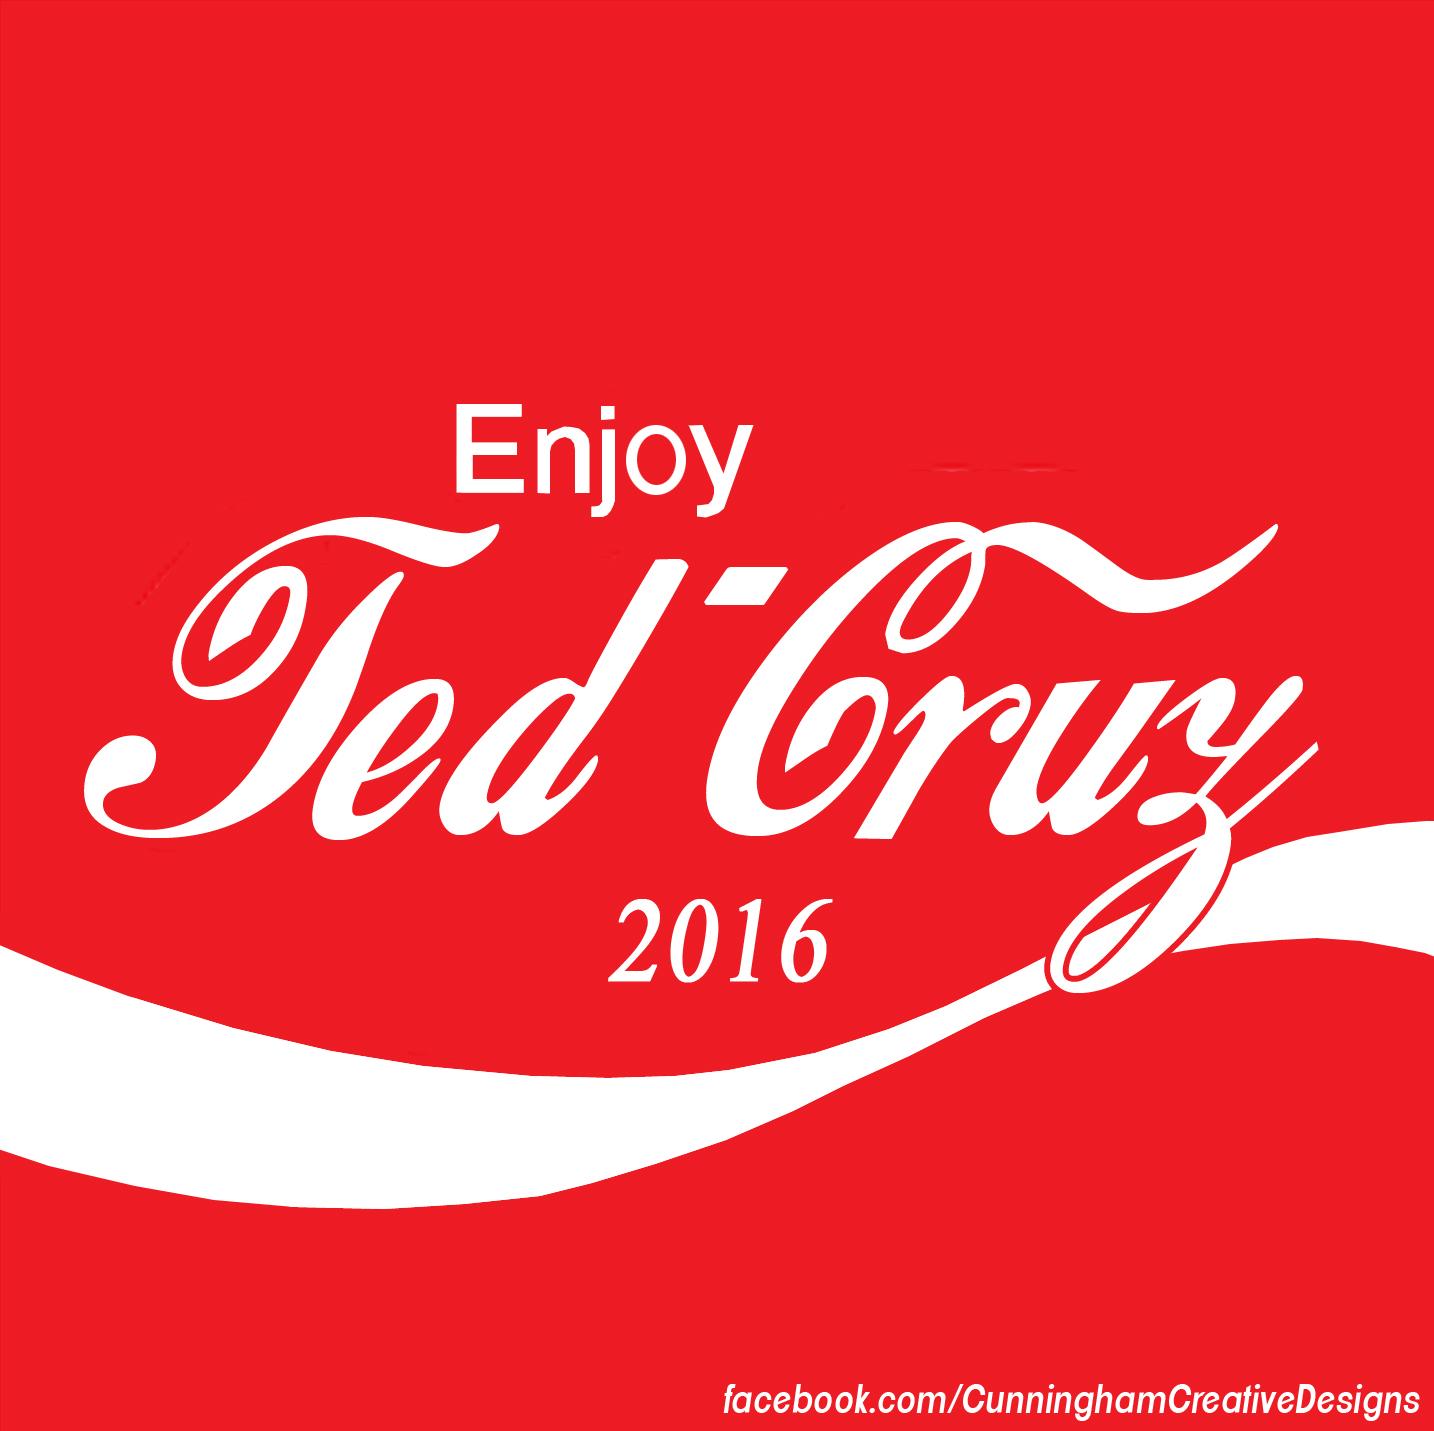 Presidential Soda Pop Series #1 Ted Cruz